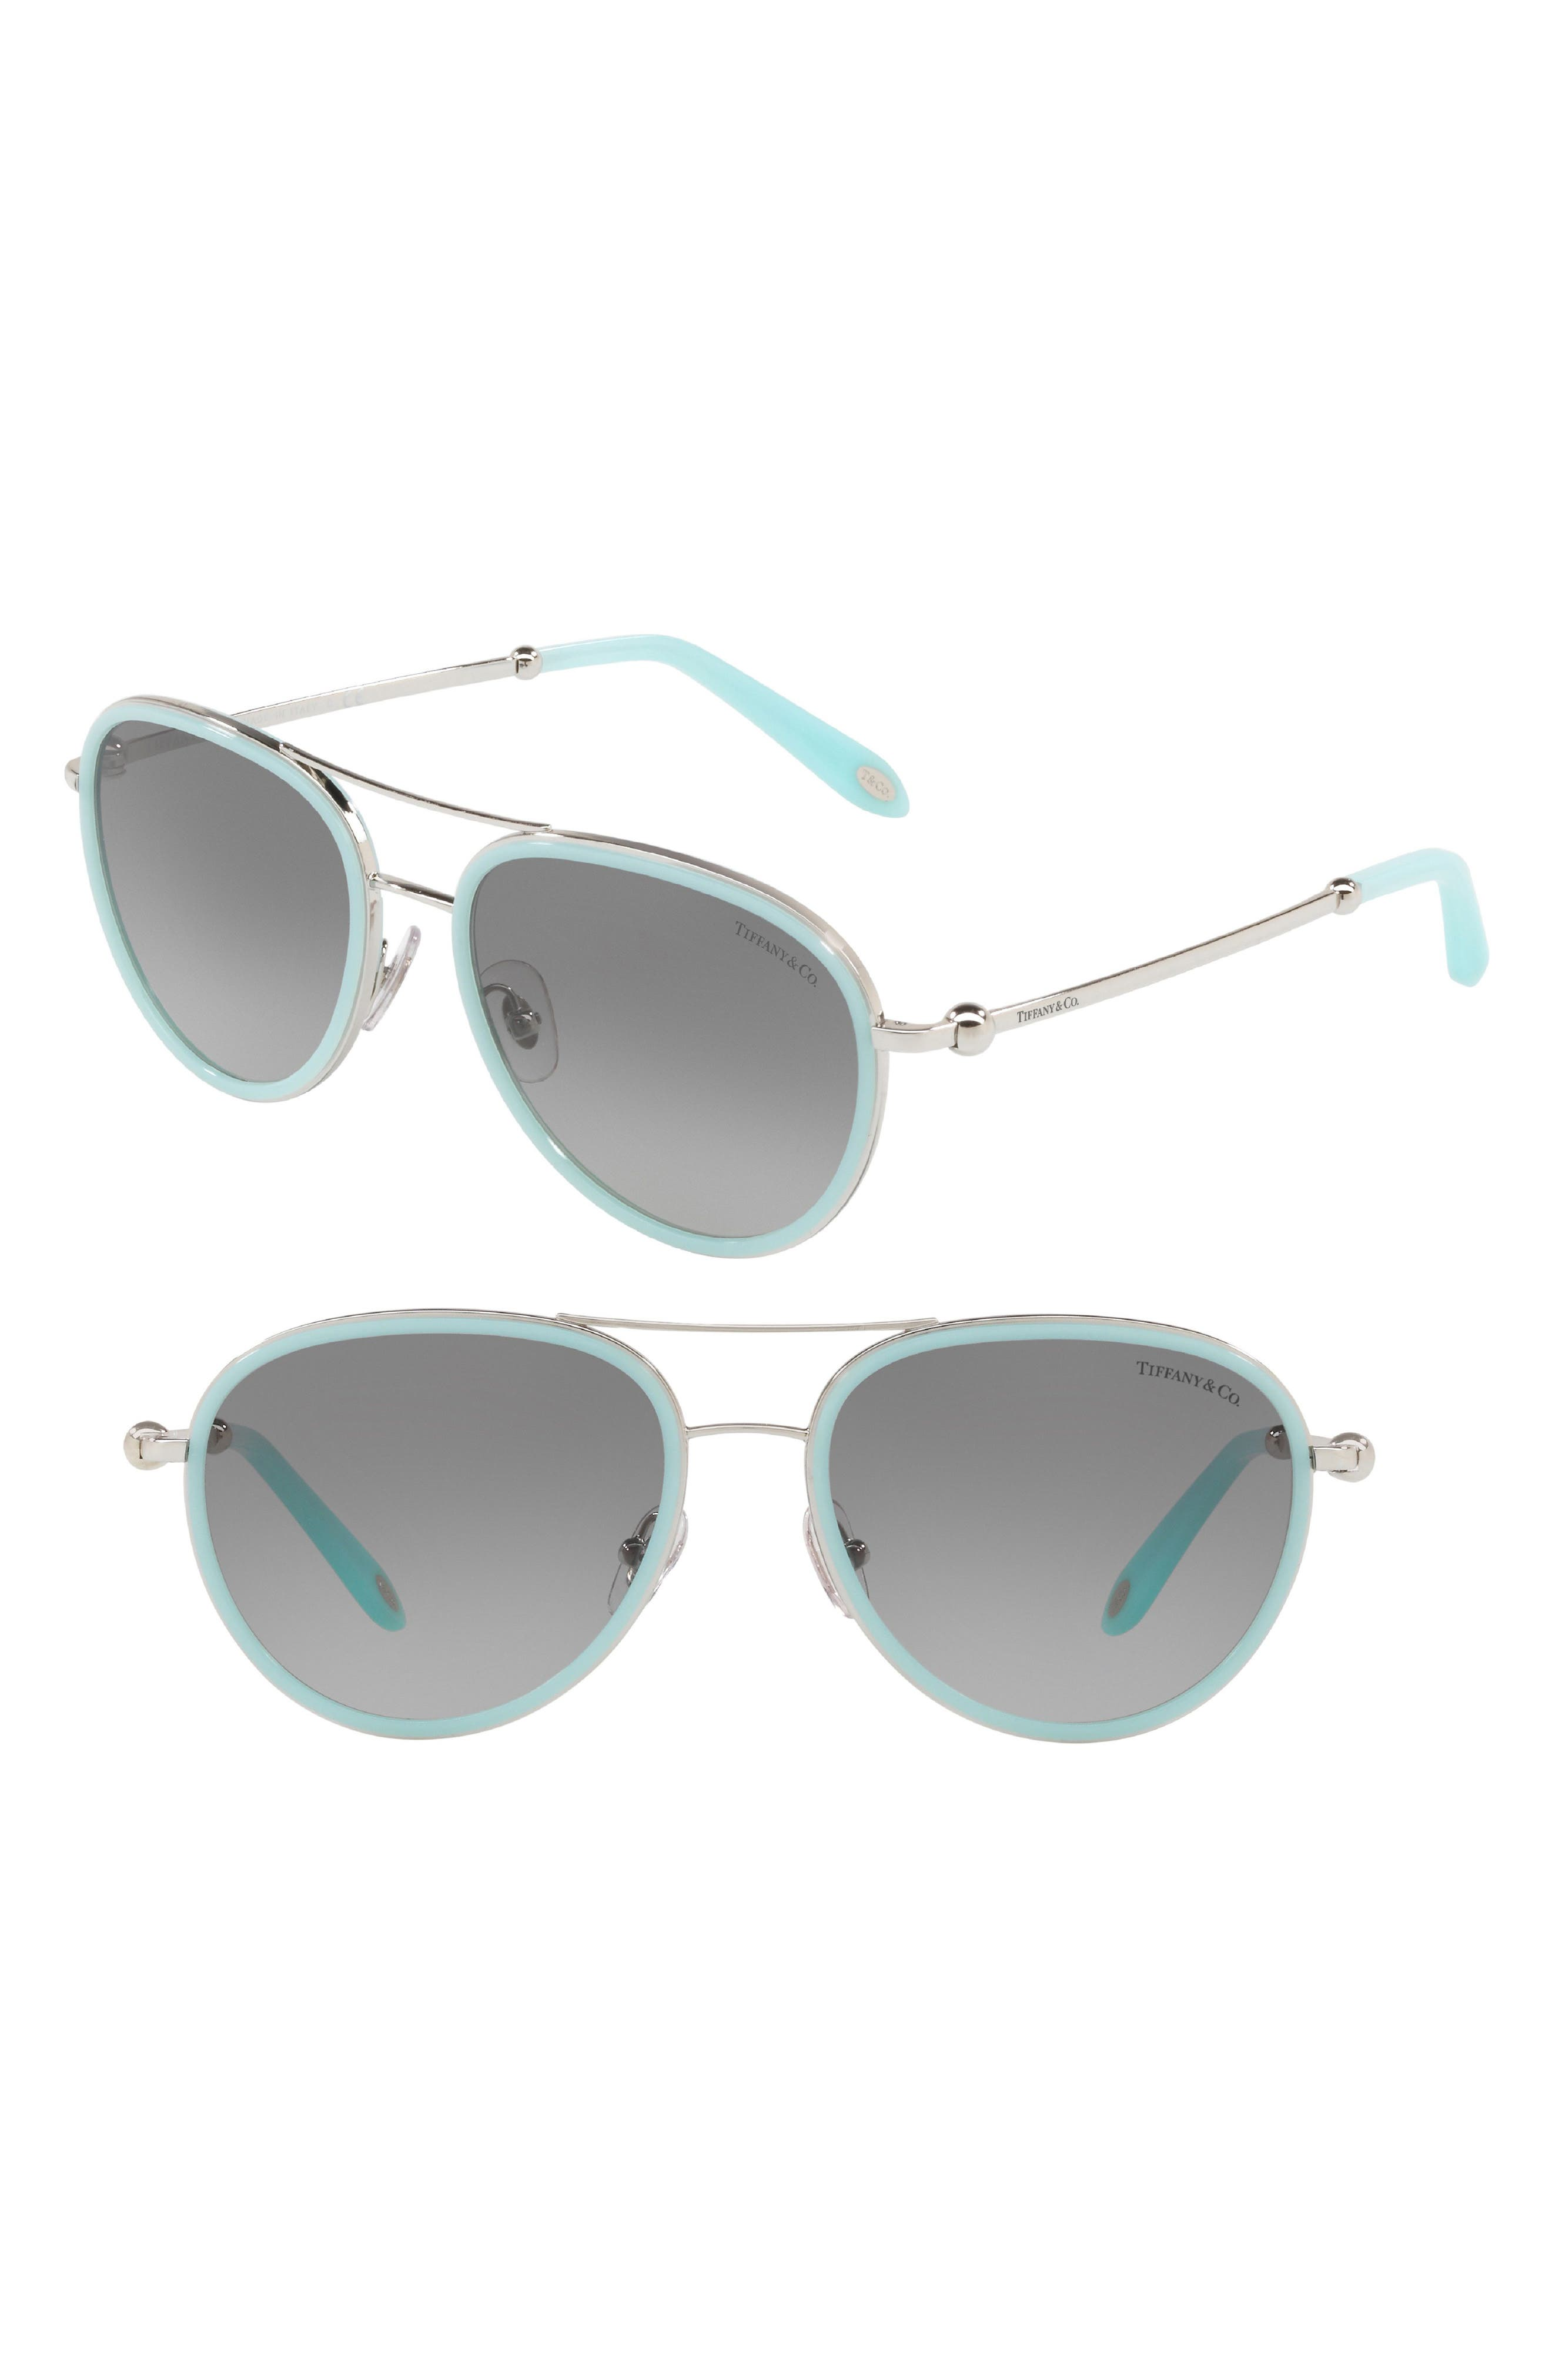 Tiffany & Co. 55mm Gradient Aviator Sunglasses